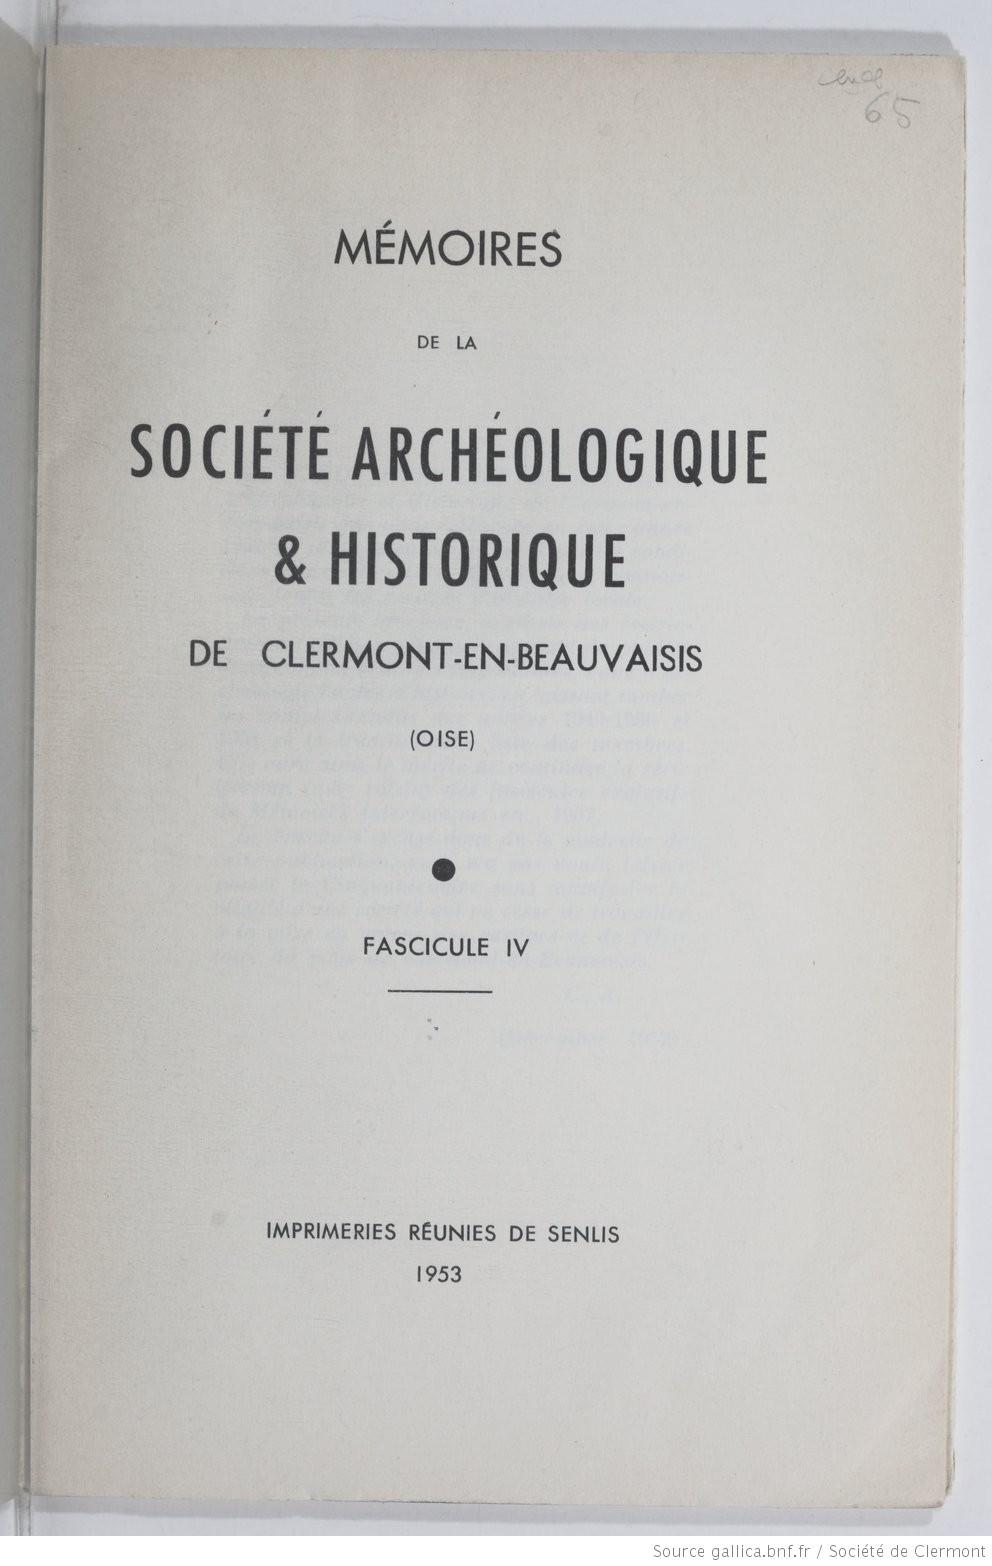 https://gallica.bnf.fr/ark:/12148/bpt6k6490521j.highres.jpg